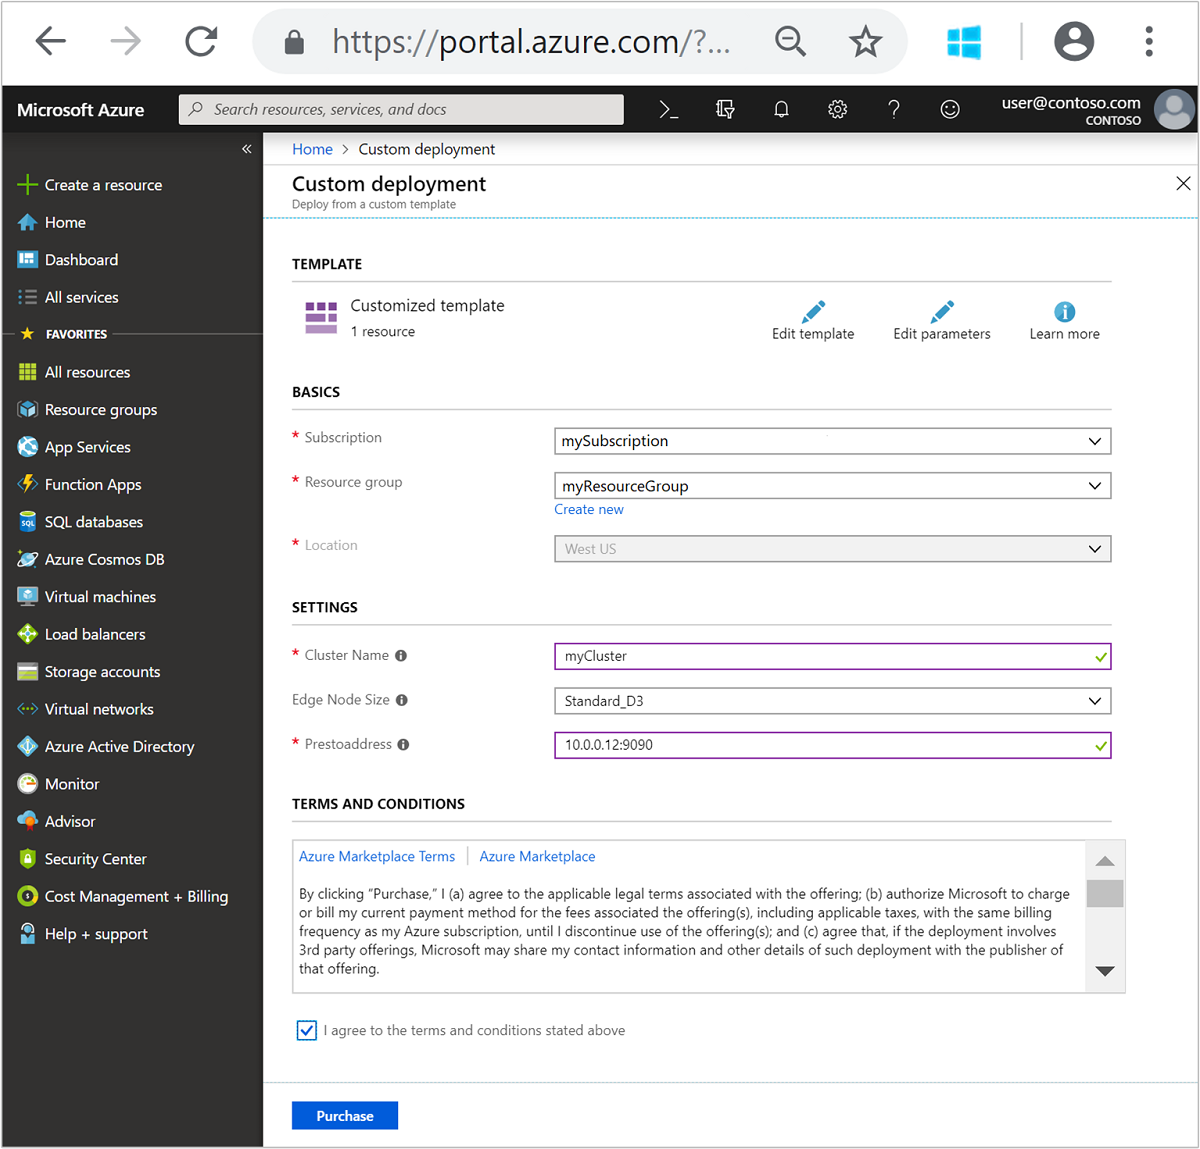 Nainstalovat Presto v clusterech Azure HDInsight s Linuxem ... 00d6348ec3